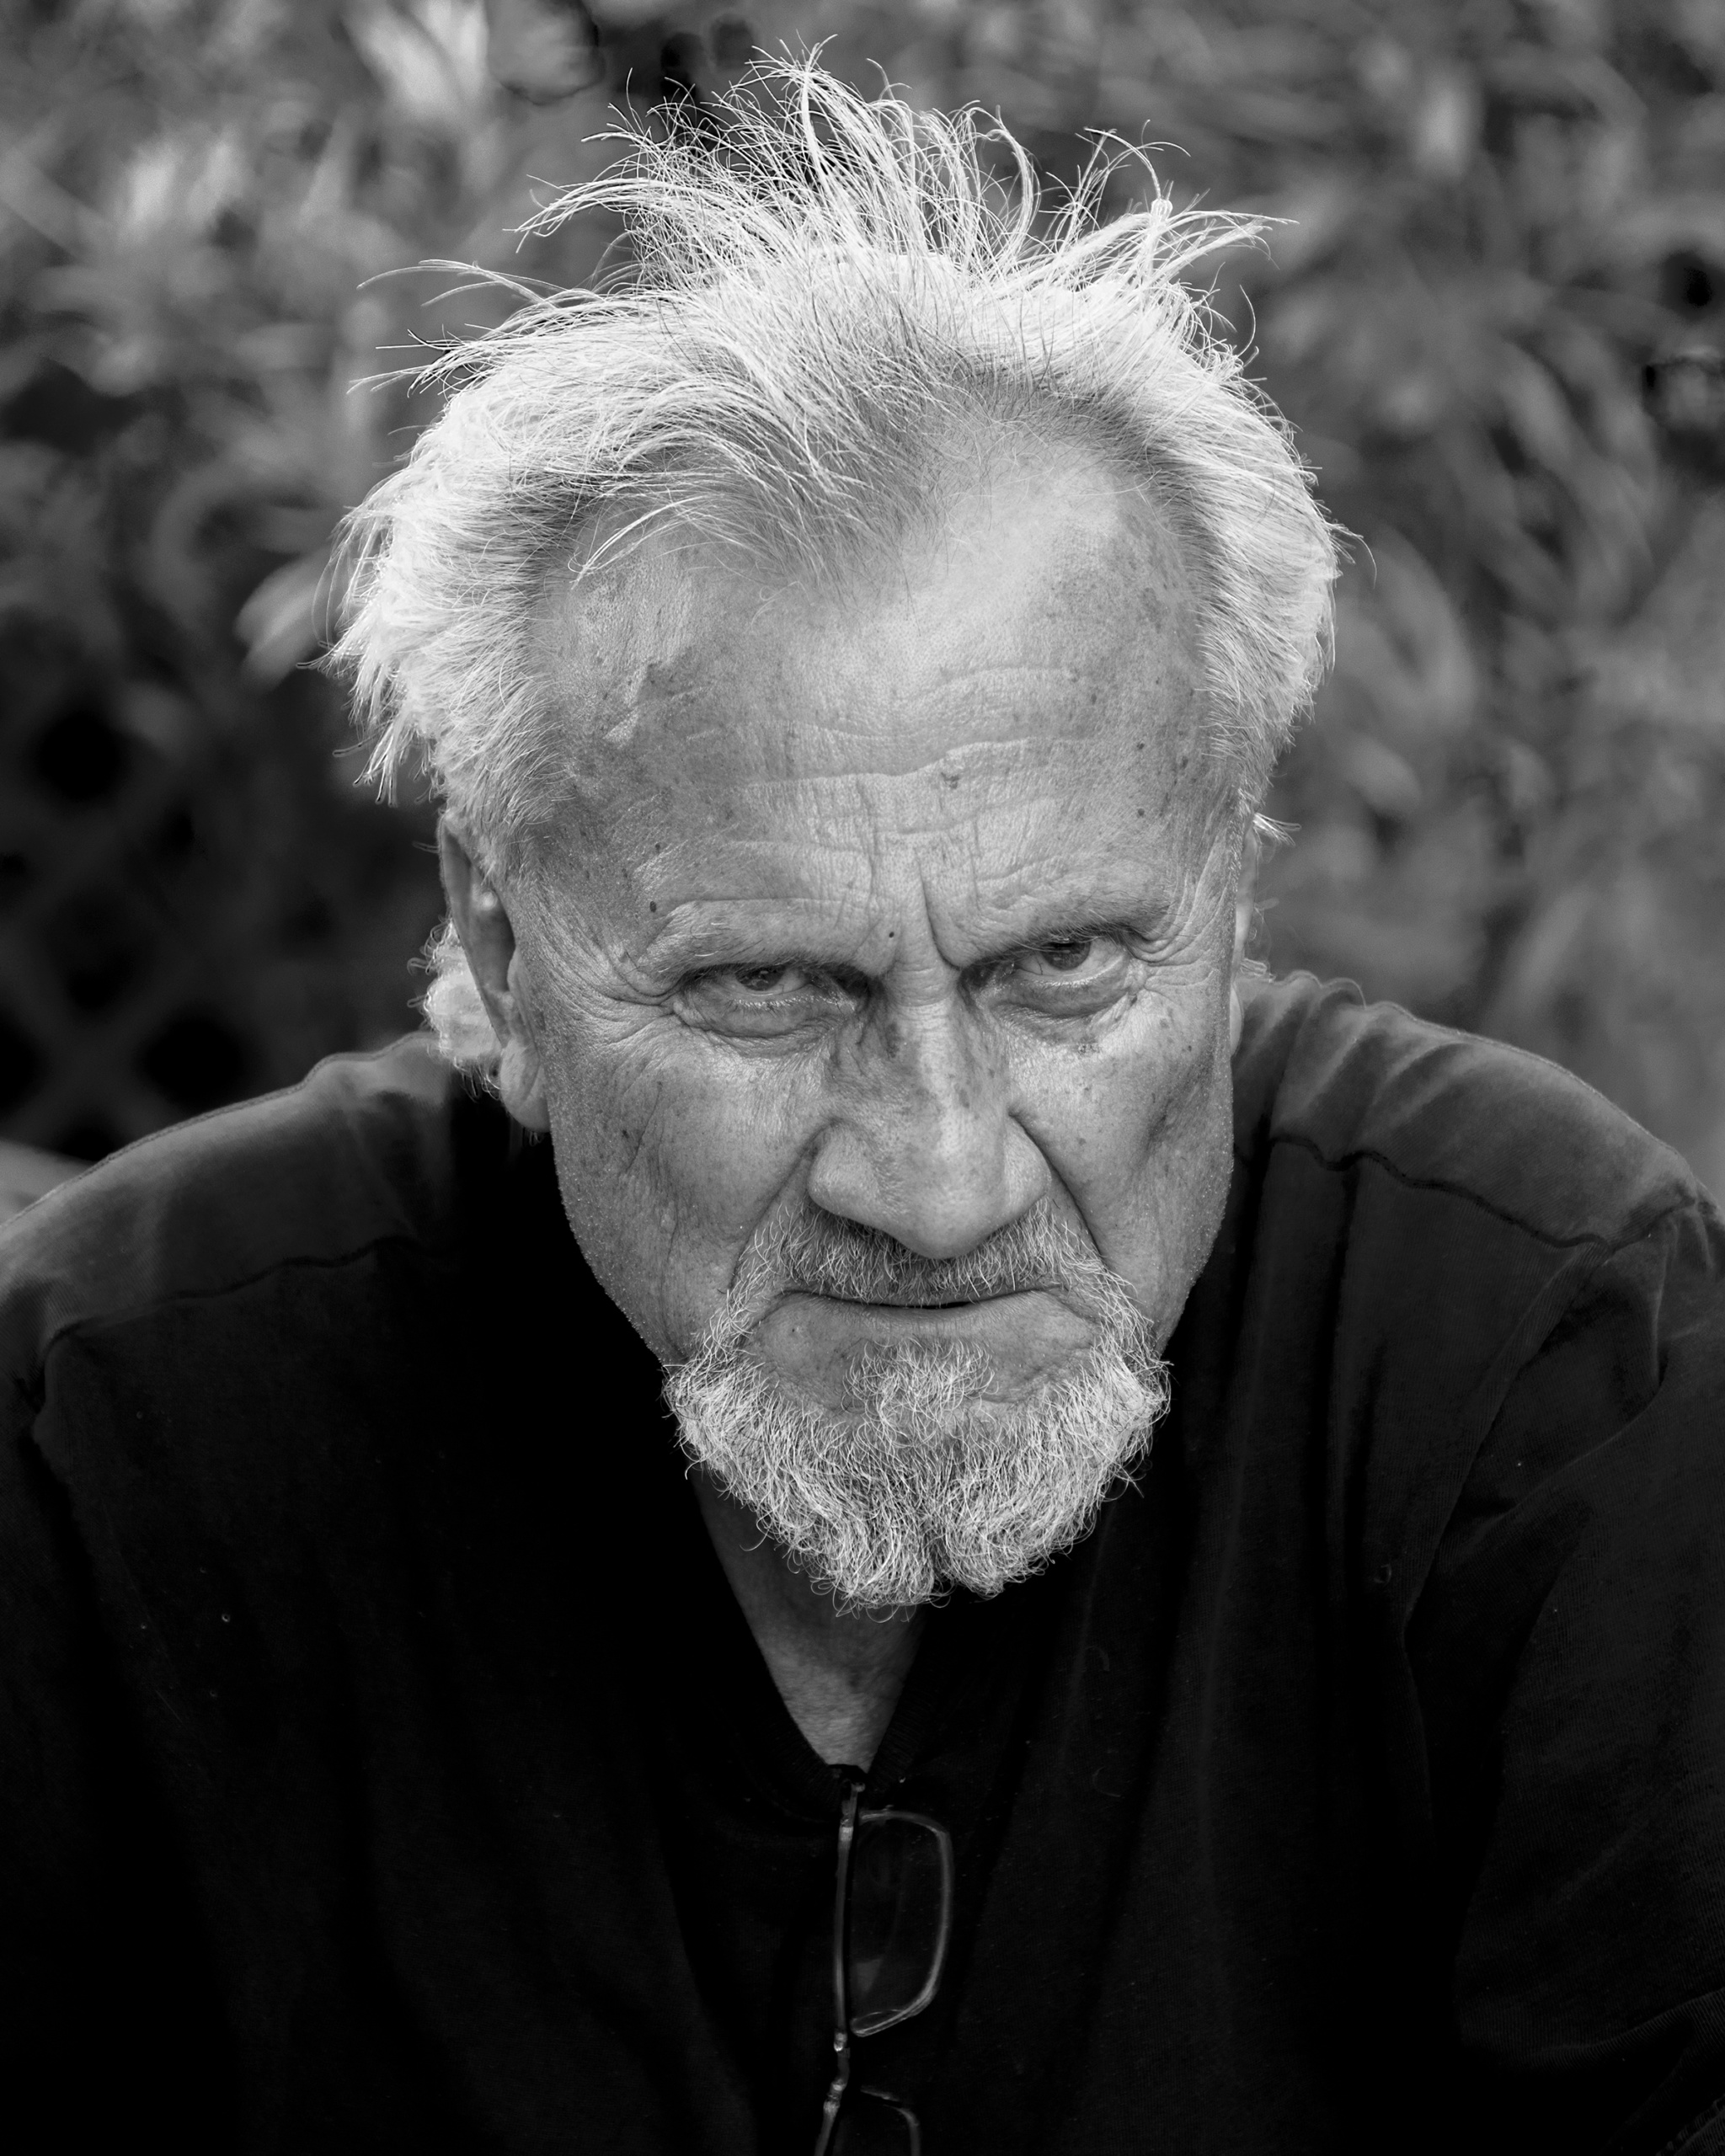 Simon Dann, Covid Tired, Canada, 2020